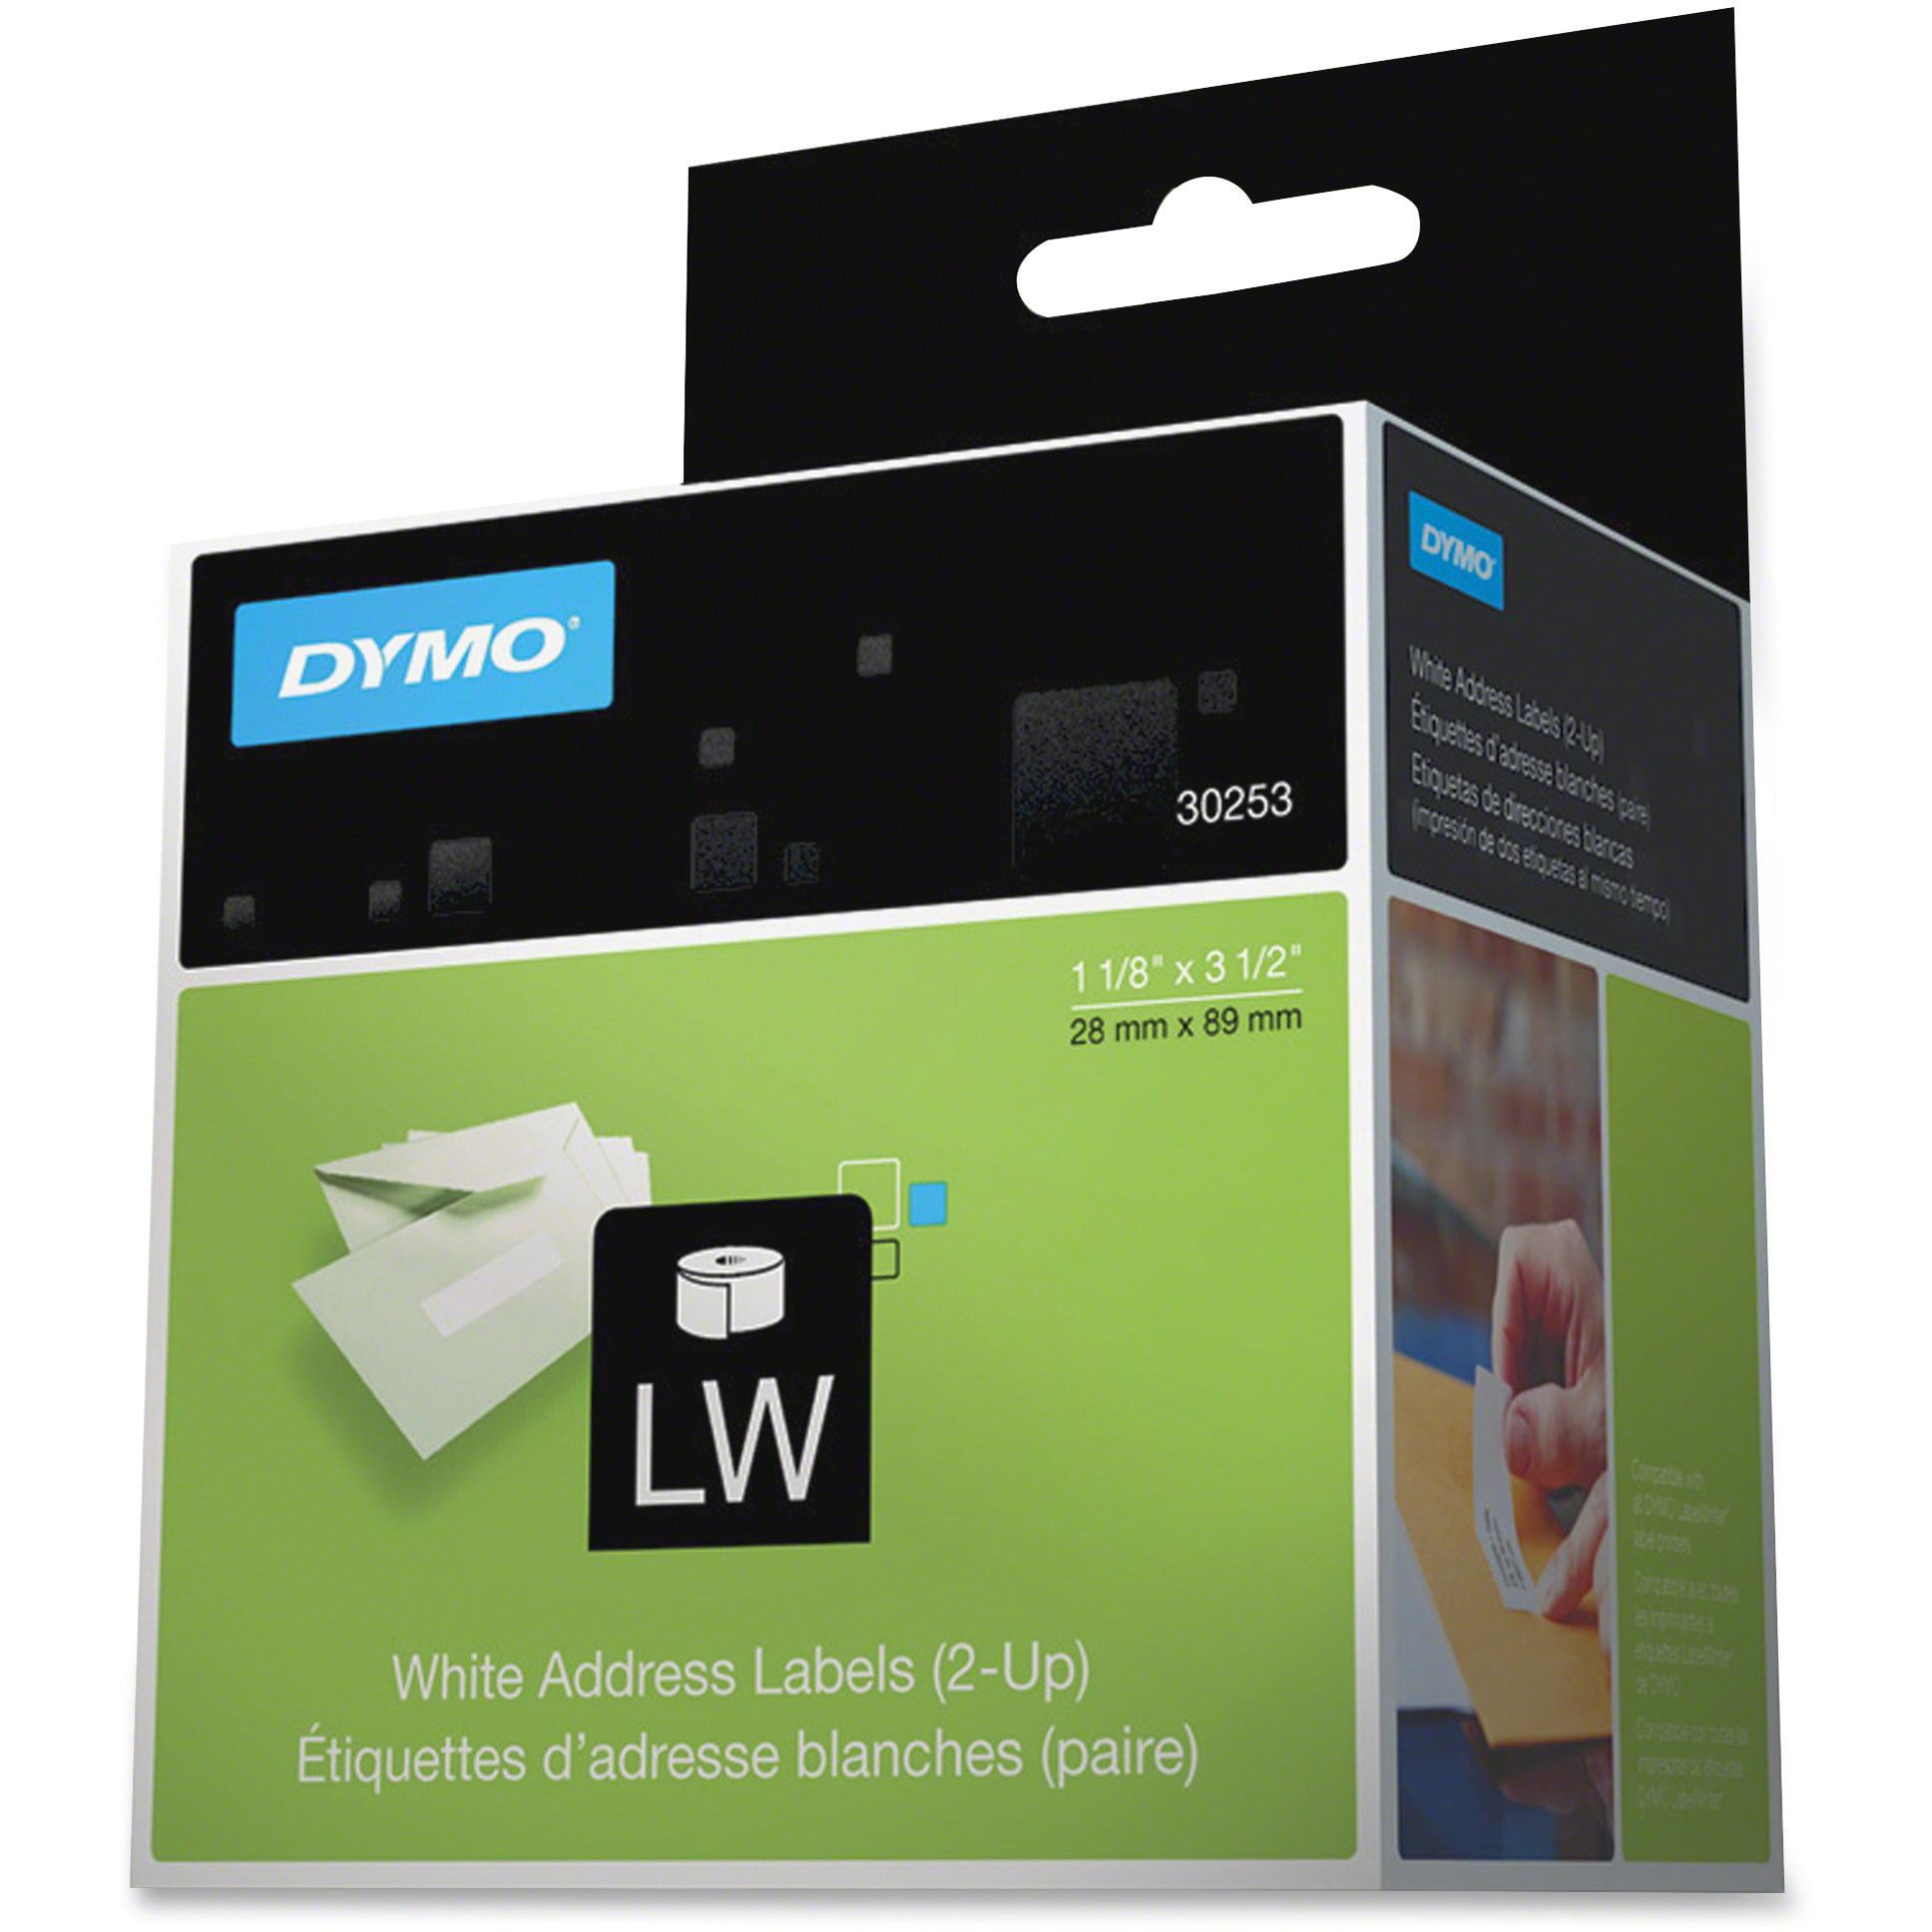 Dymo, DYM30253, Two-up LW Address Labels, 700 / Each, White